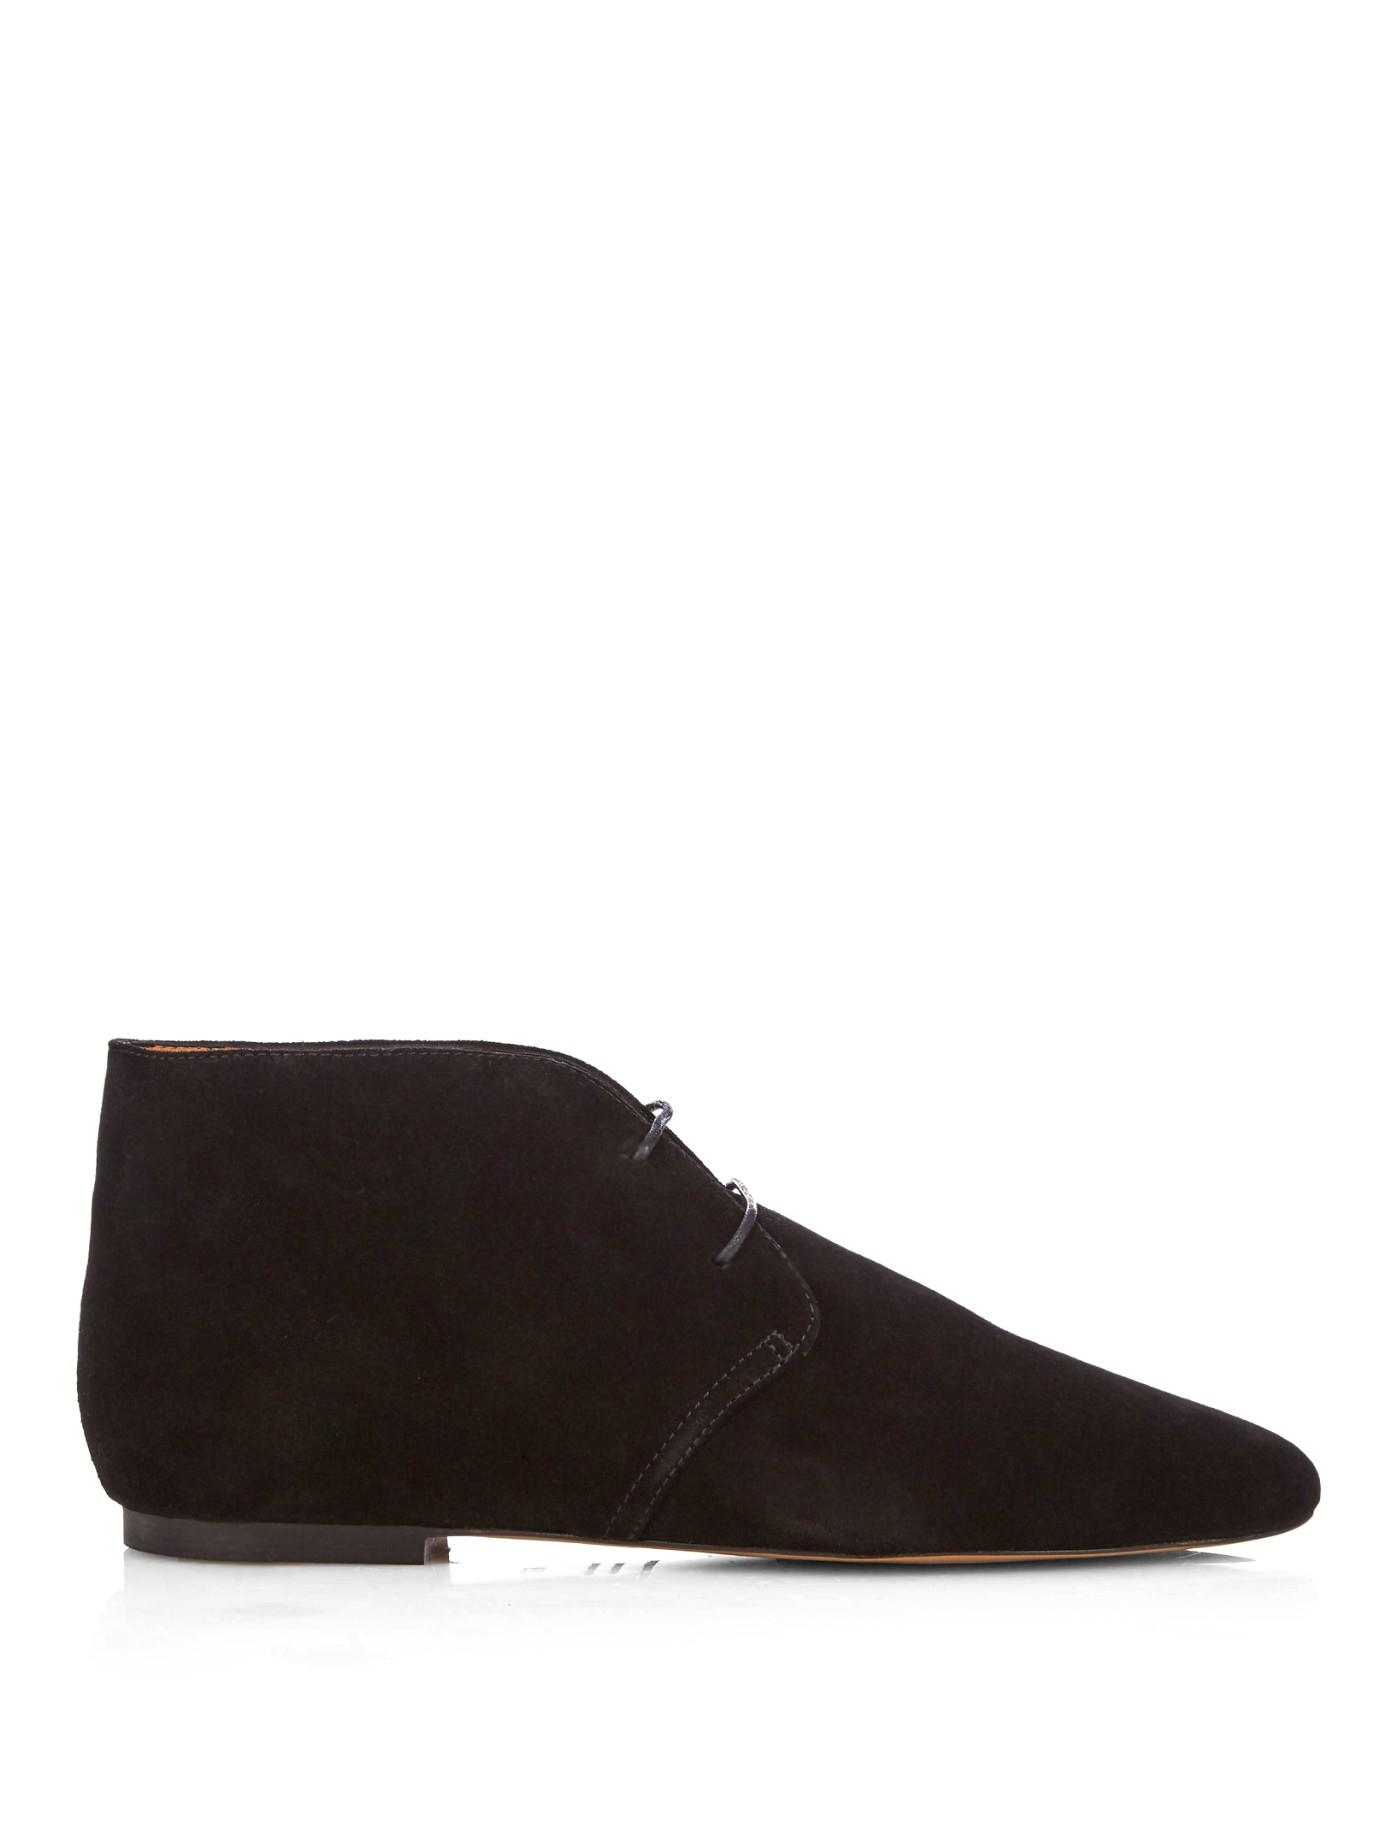 Isabel Marant Black Suede Derst Boots sale wholesale price qlWXiel6